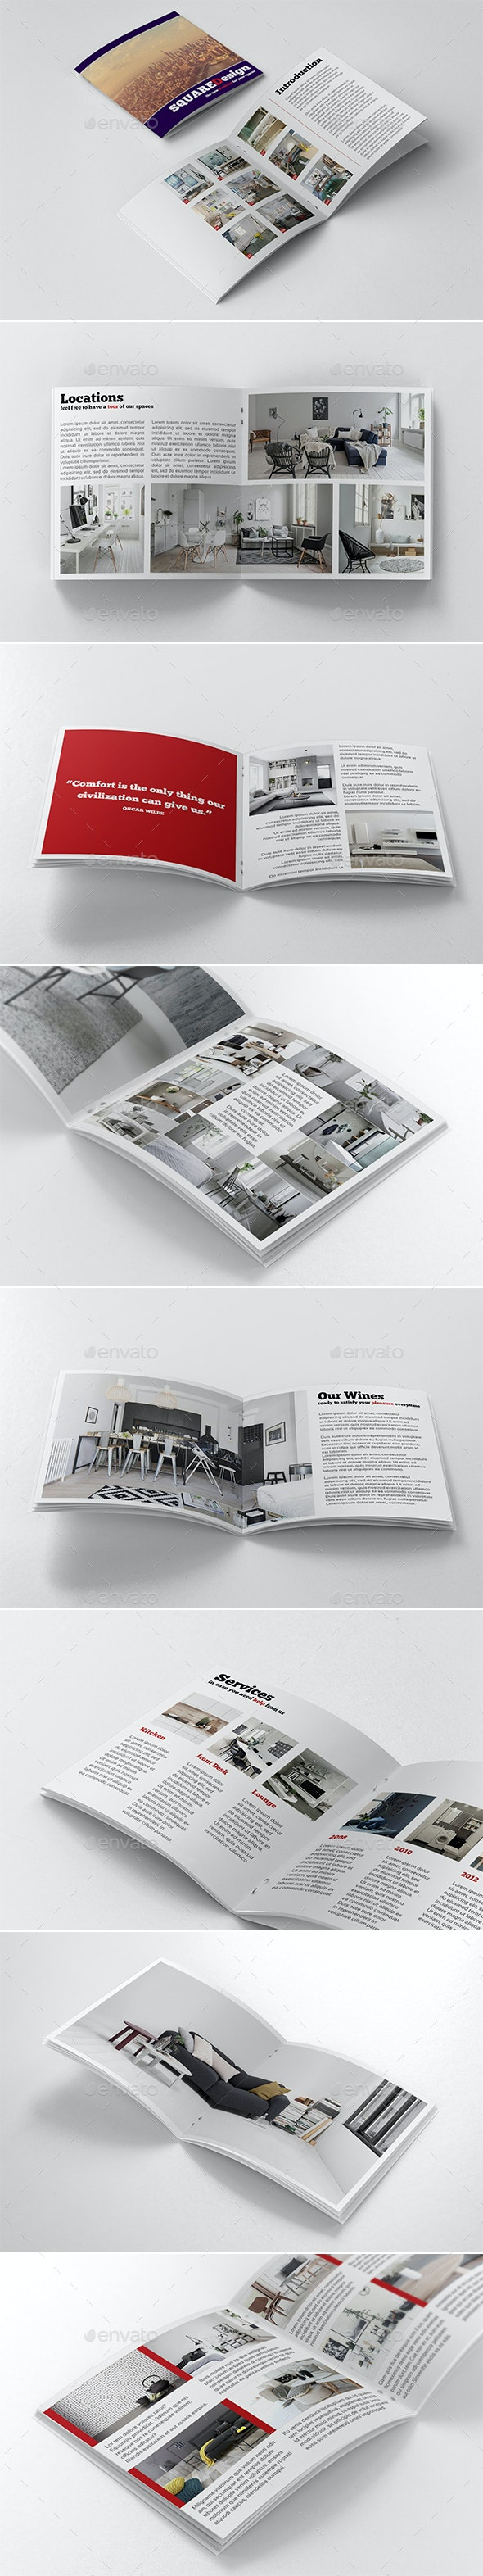 Square Design Booklet - Catalogs Brochures